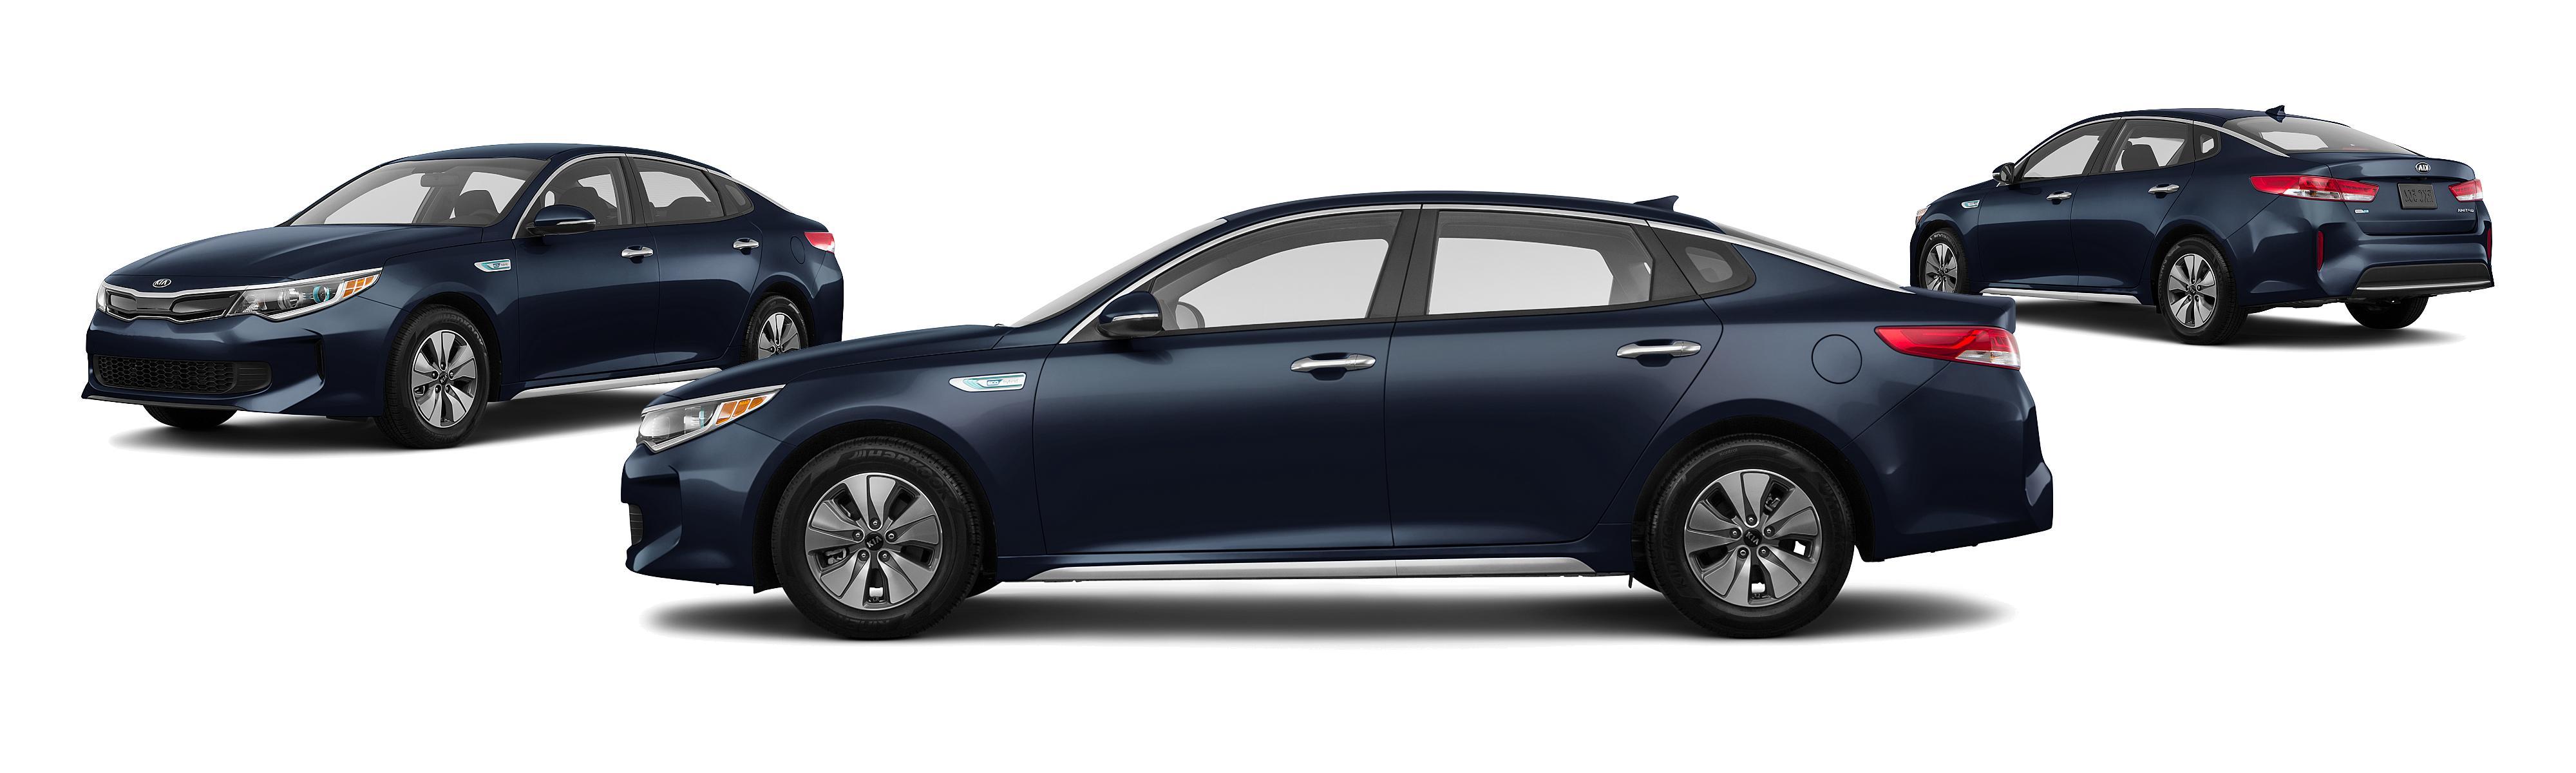 2017 Kia Optima Hybrid EX 4dr Sedan Research GrooveCar